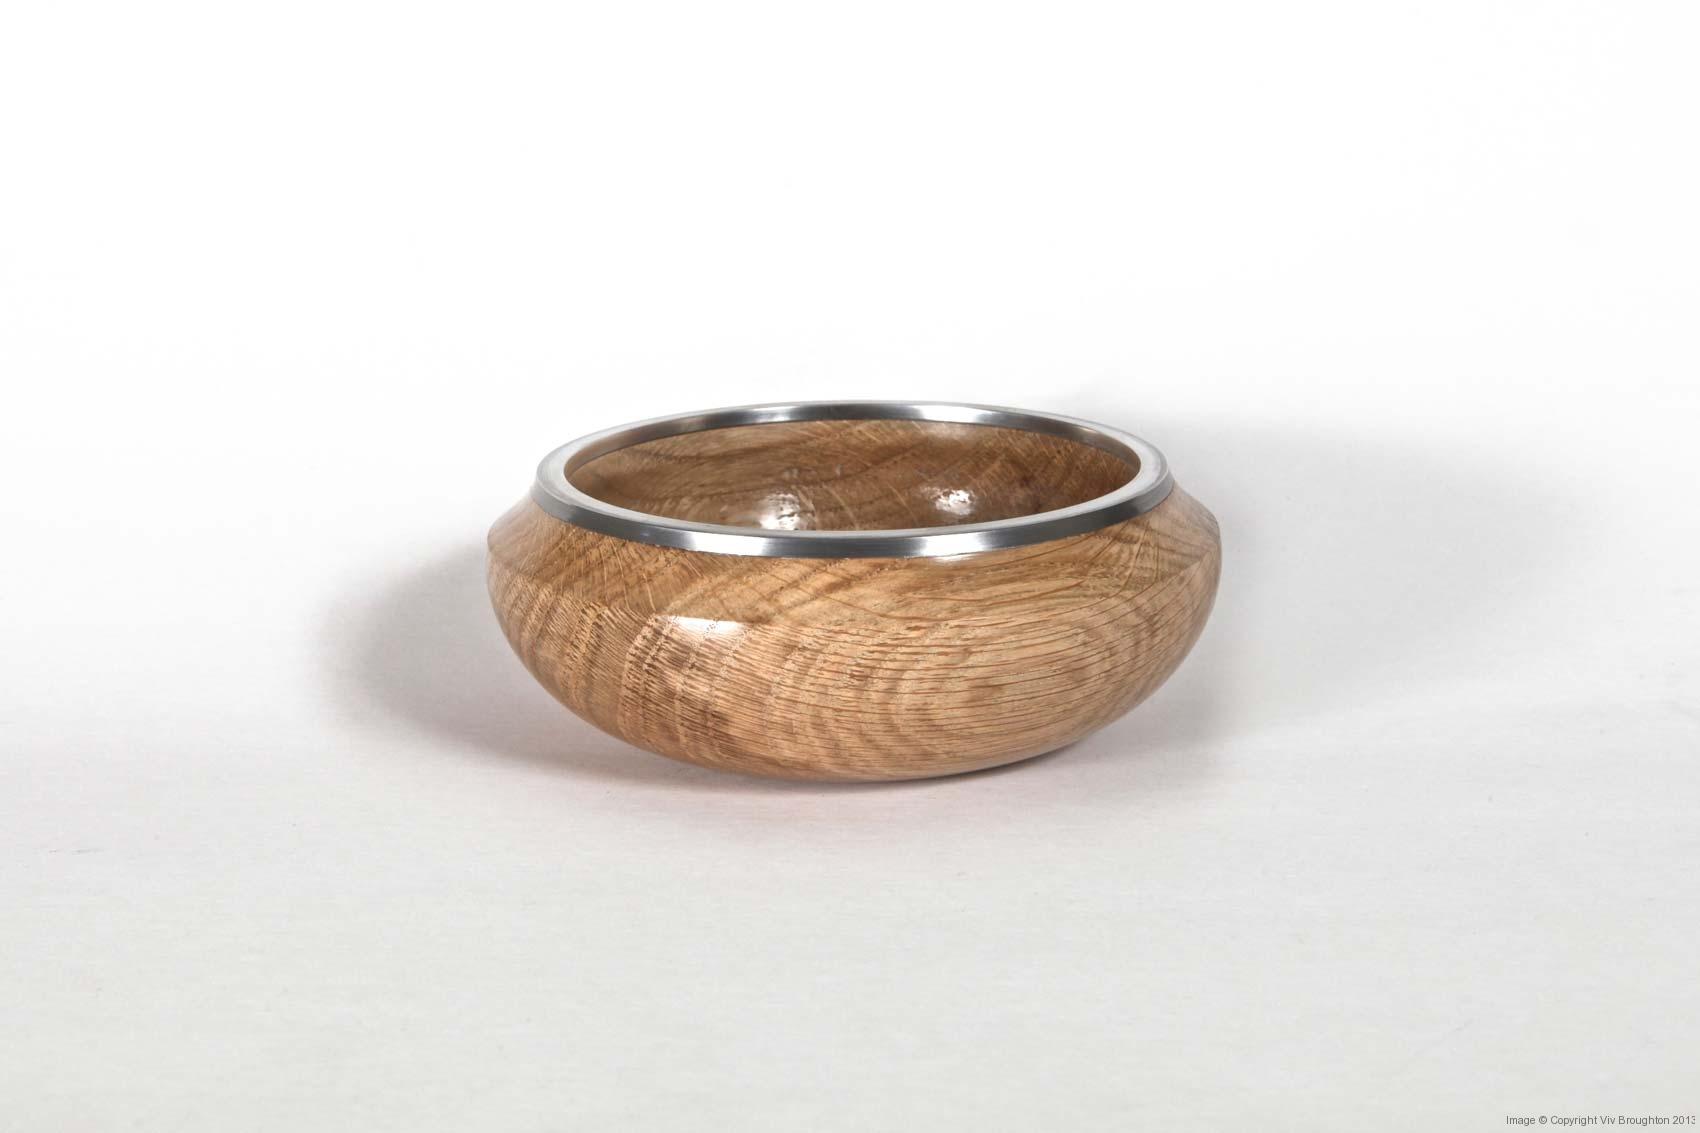 oak-bowl-with-narrow-pewter-rim